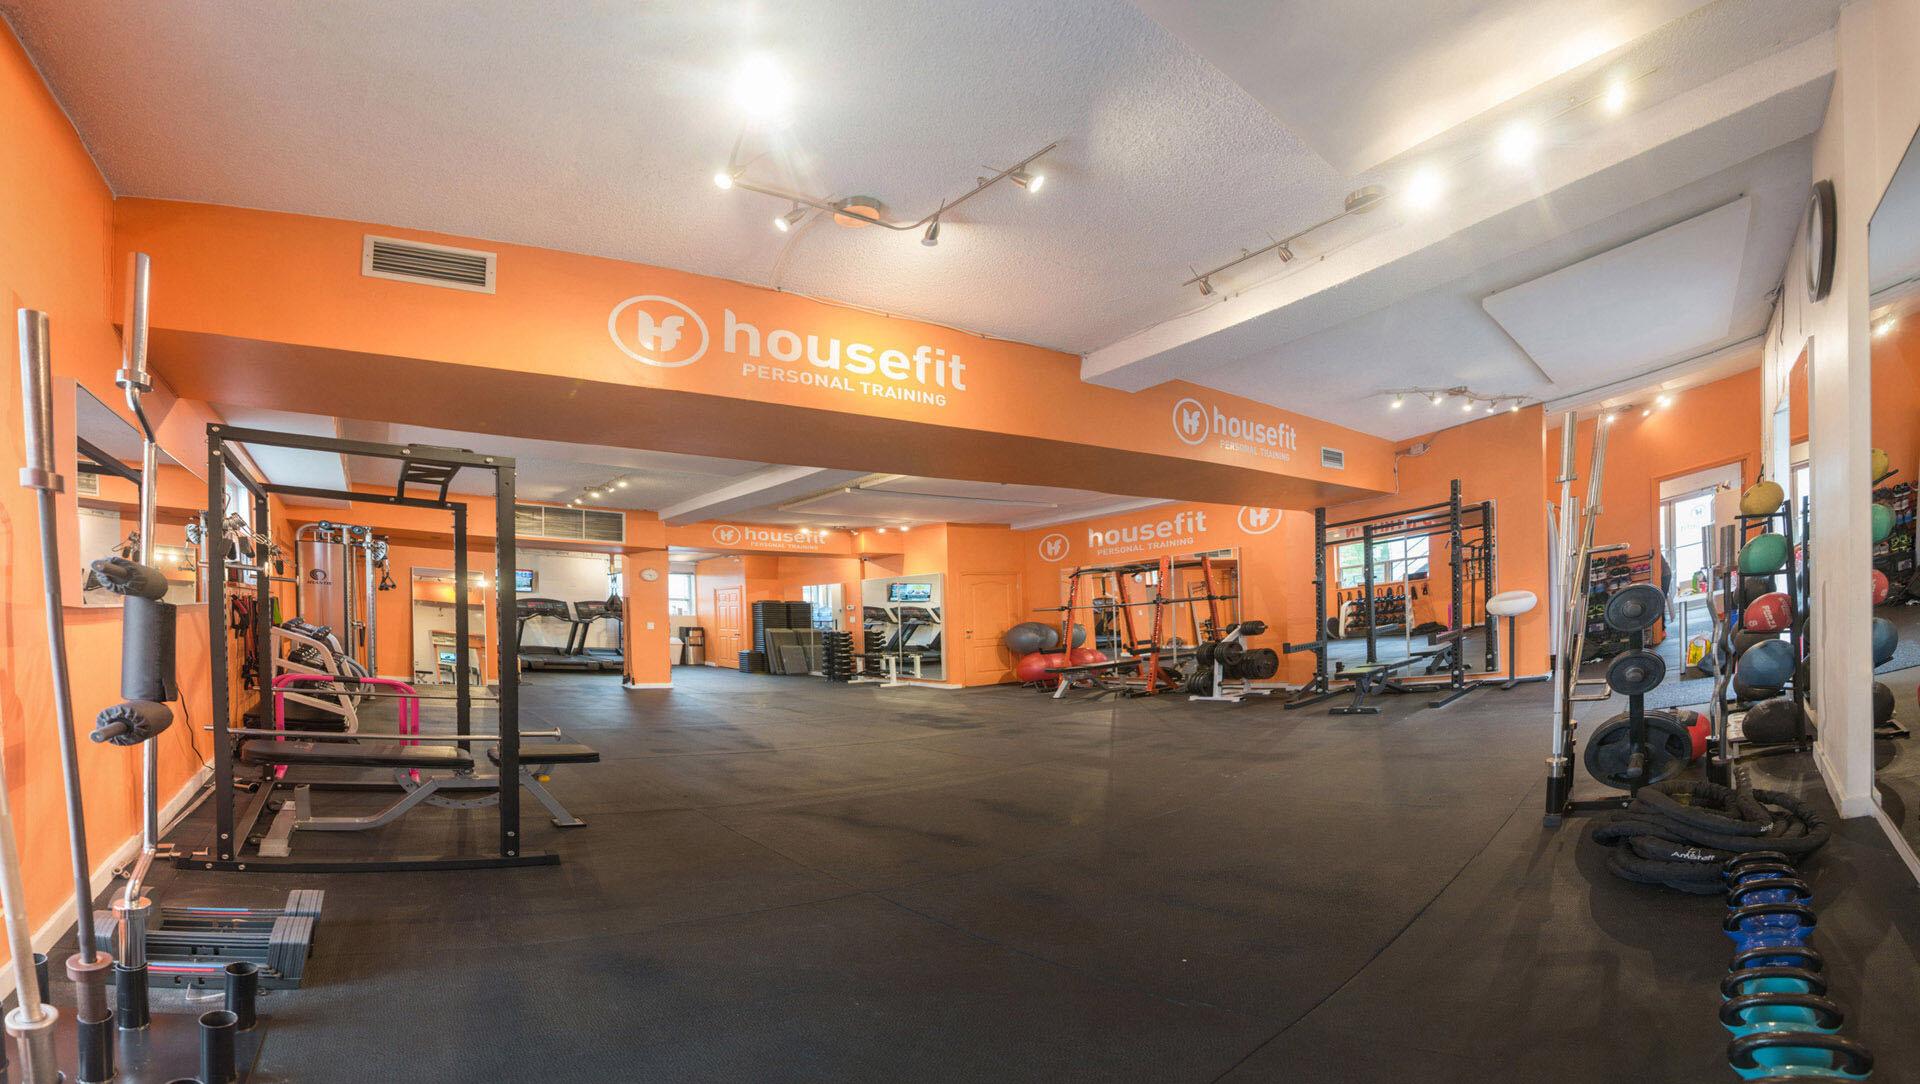 housefit-personaltrainertoronto-005.jpg